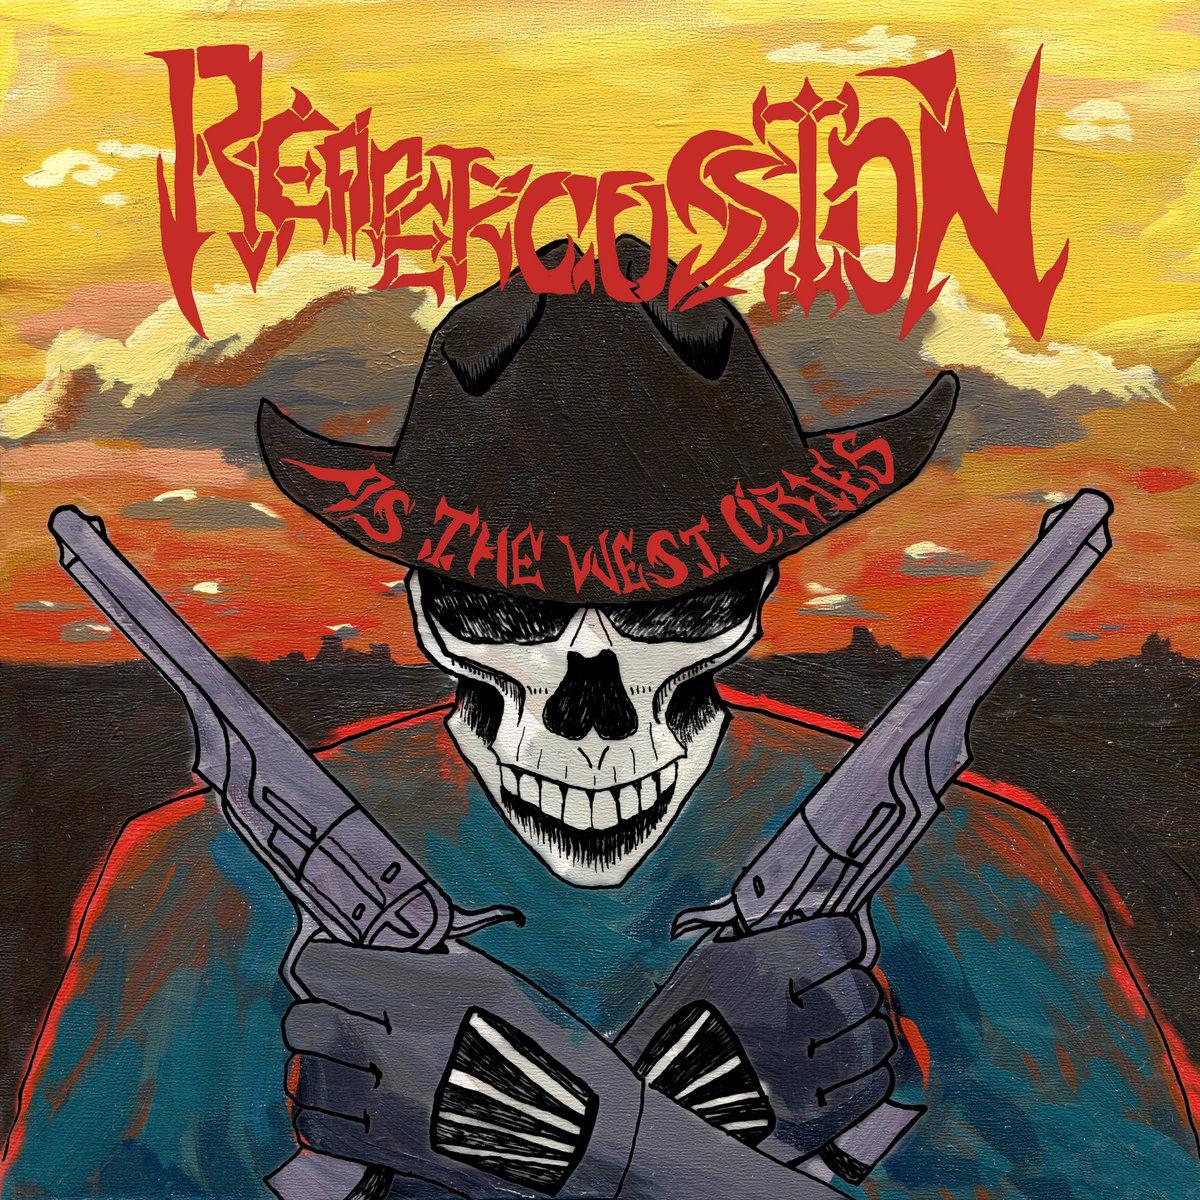 www.facebook.com/reapercussionband